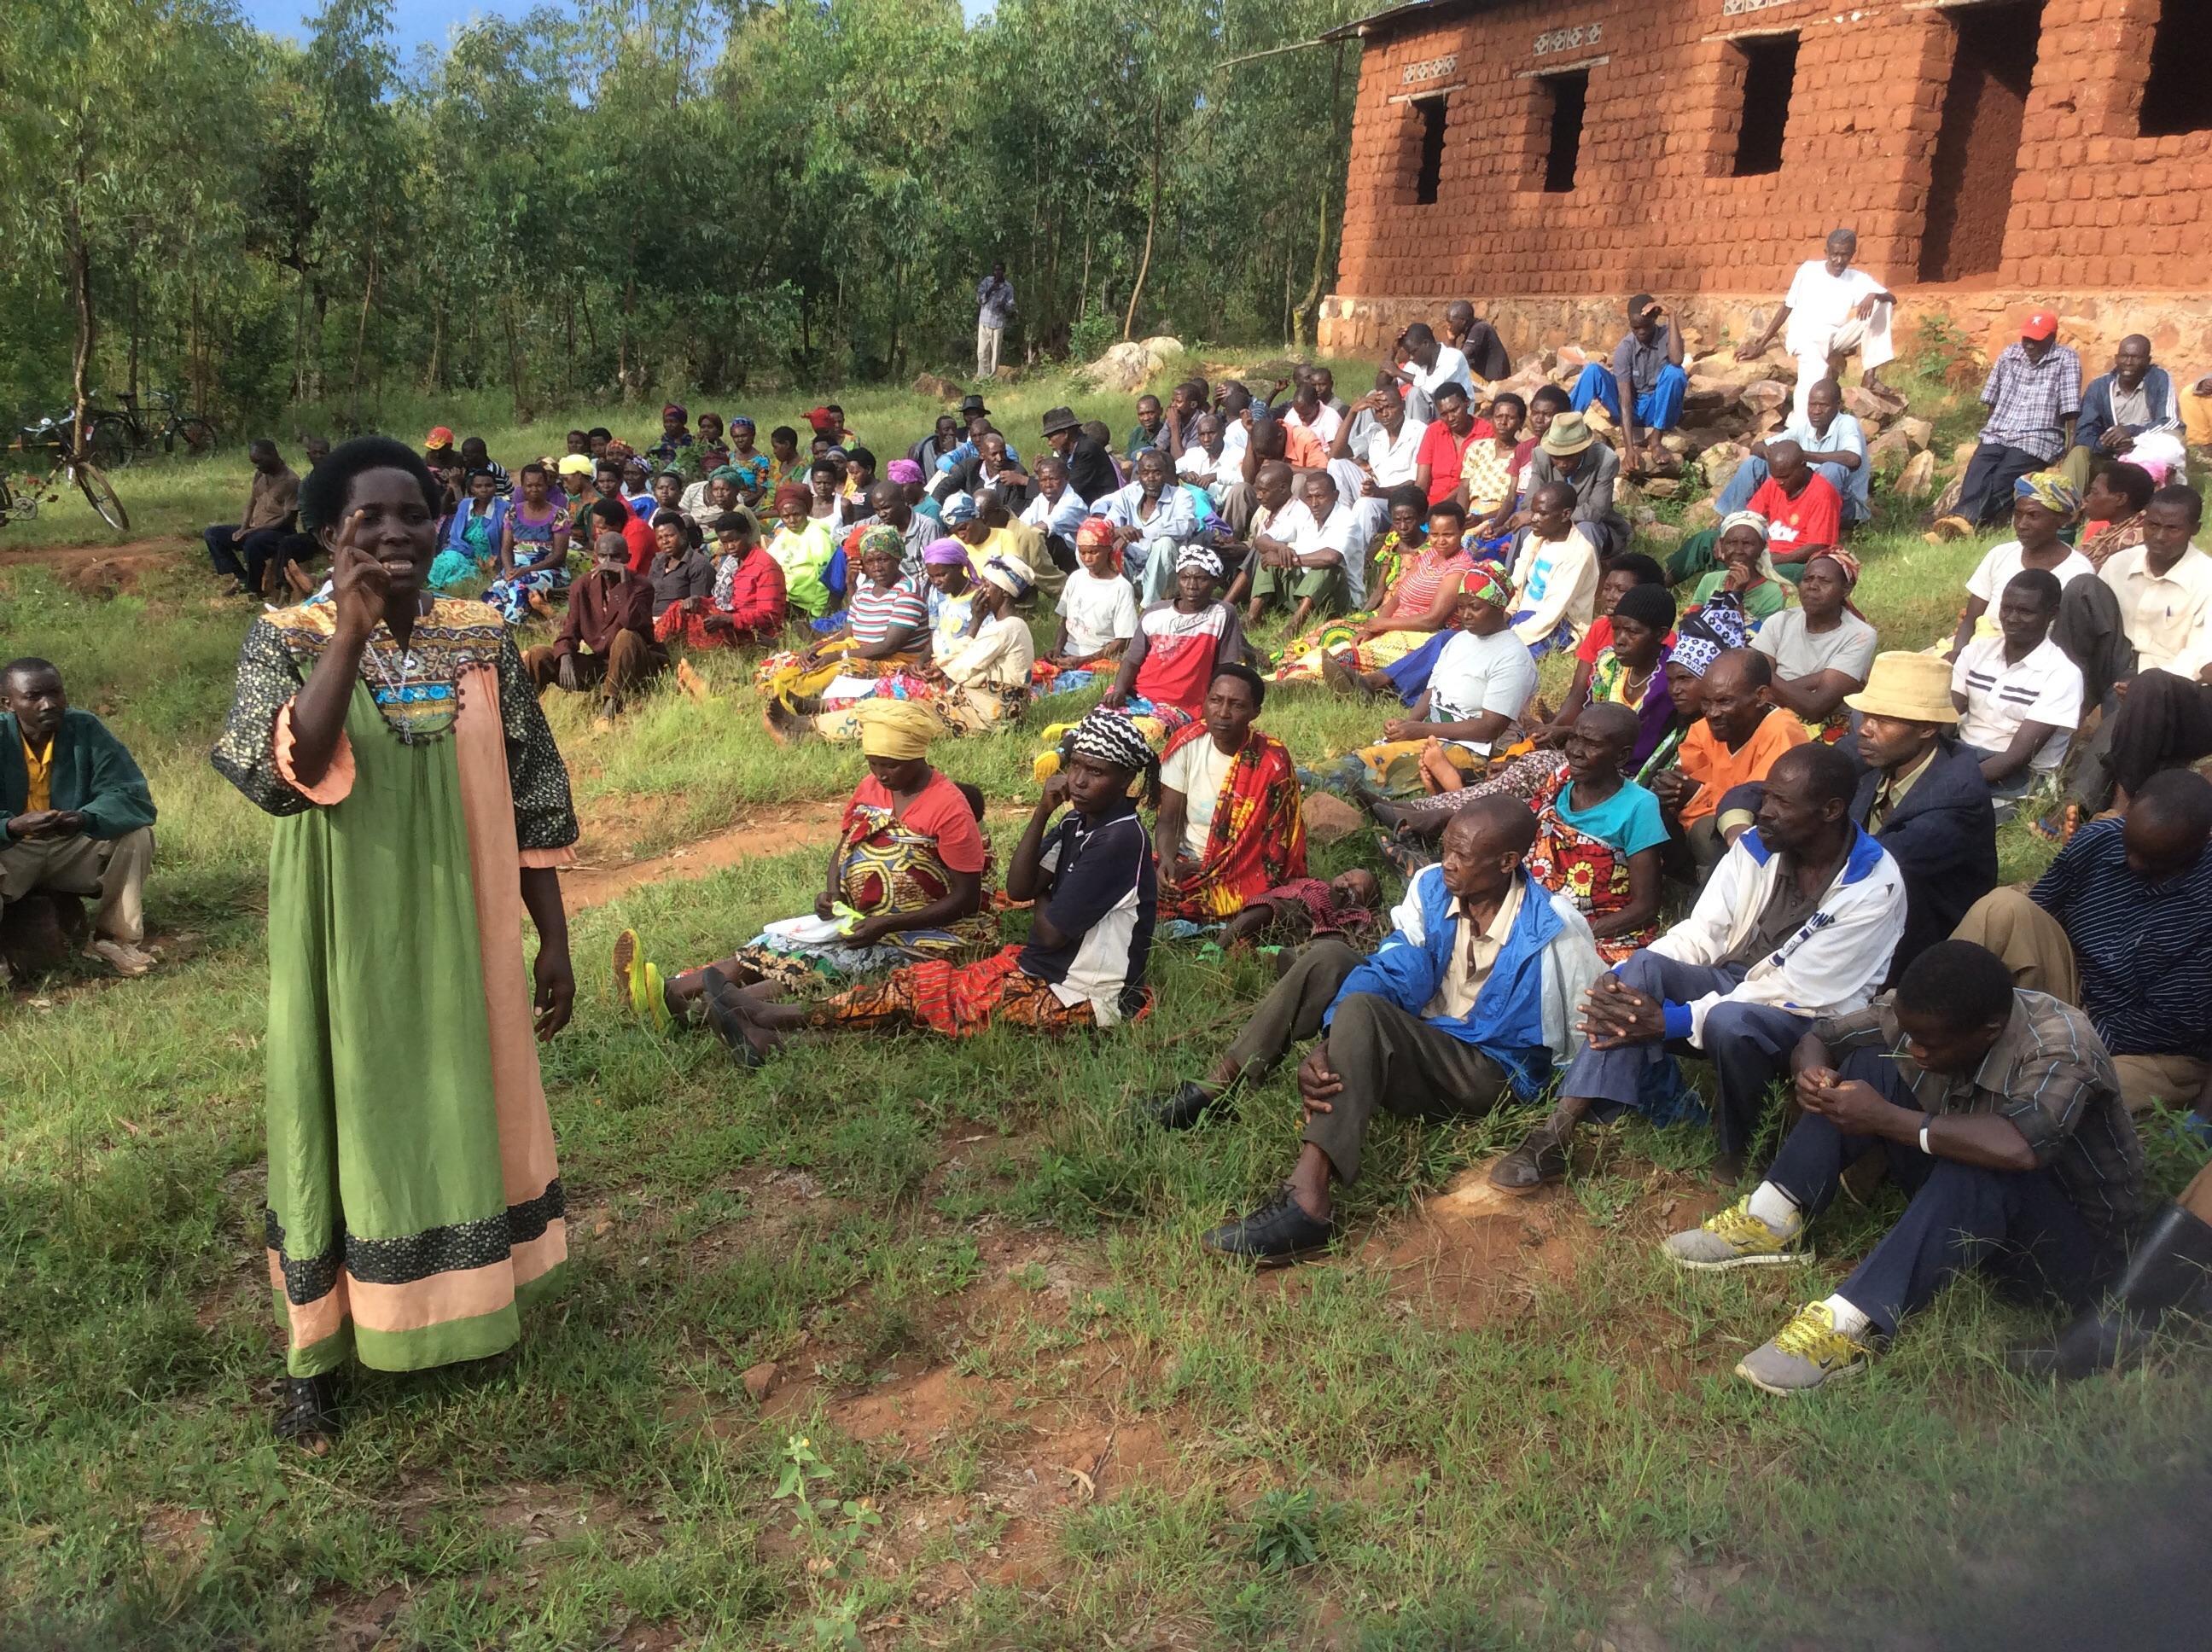 Mumeya Leaders Train 500 People Seeking To Empower Their Communities